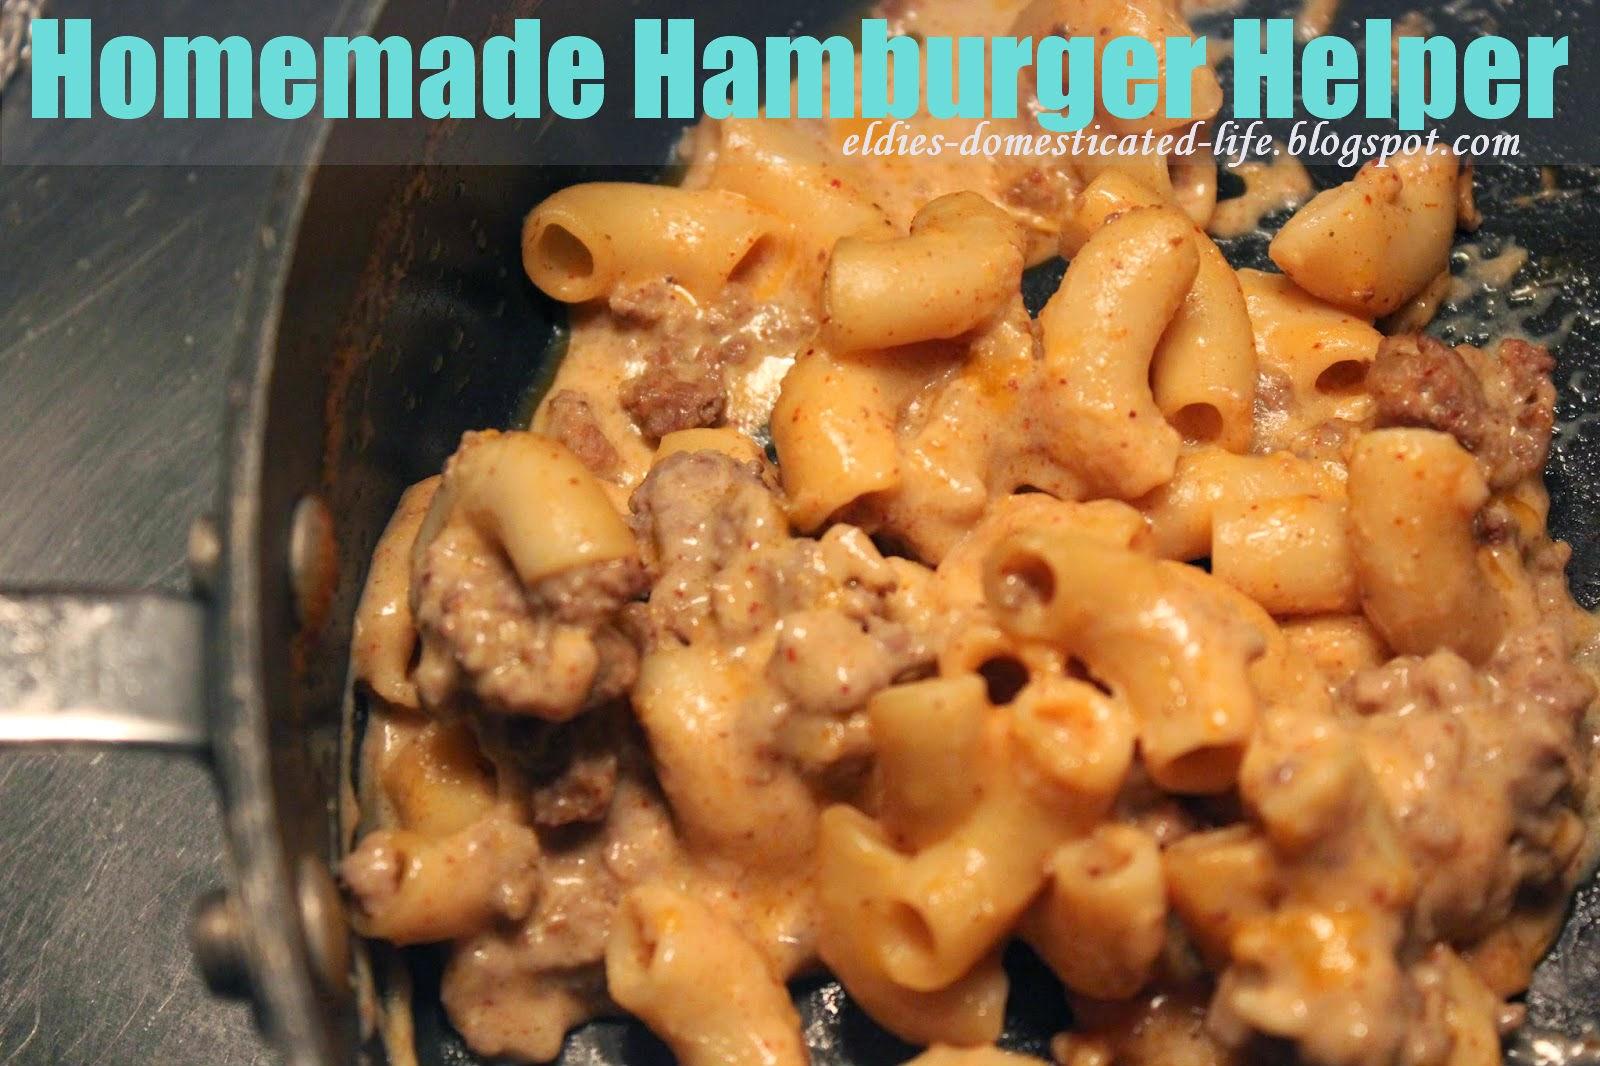 Homemade Hamburger Helper!